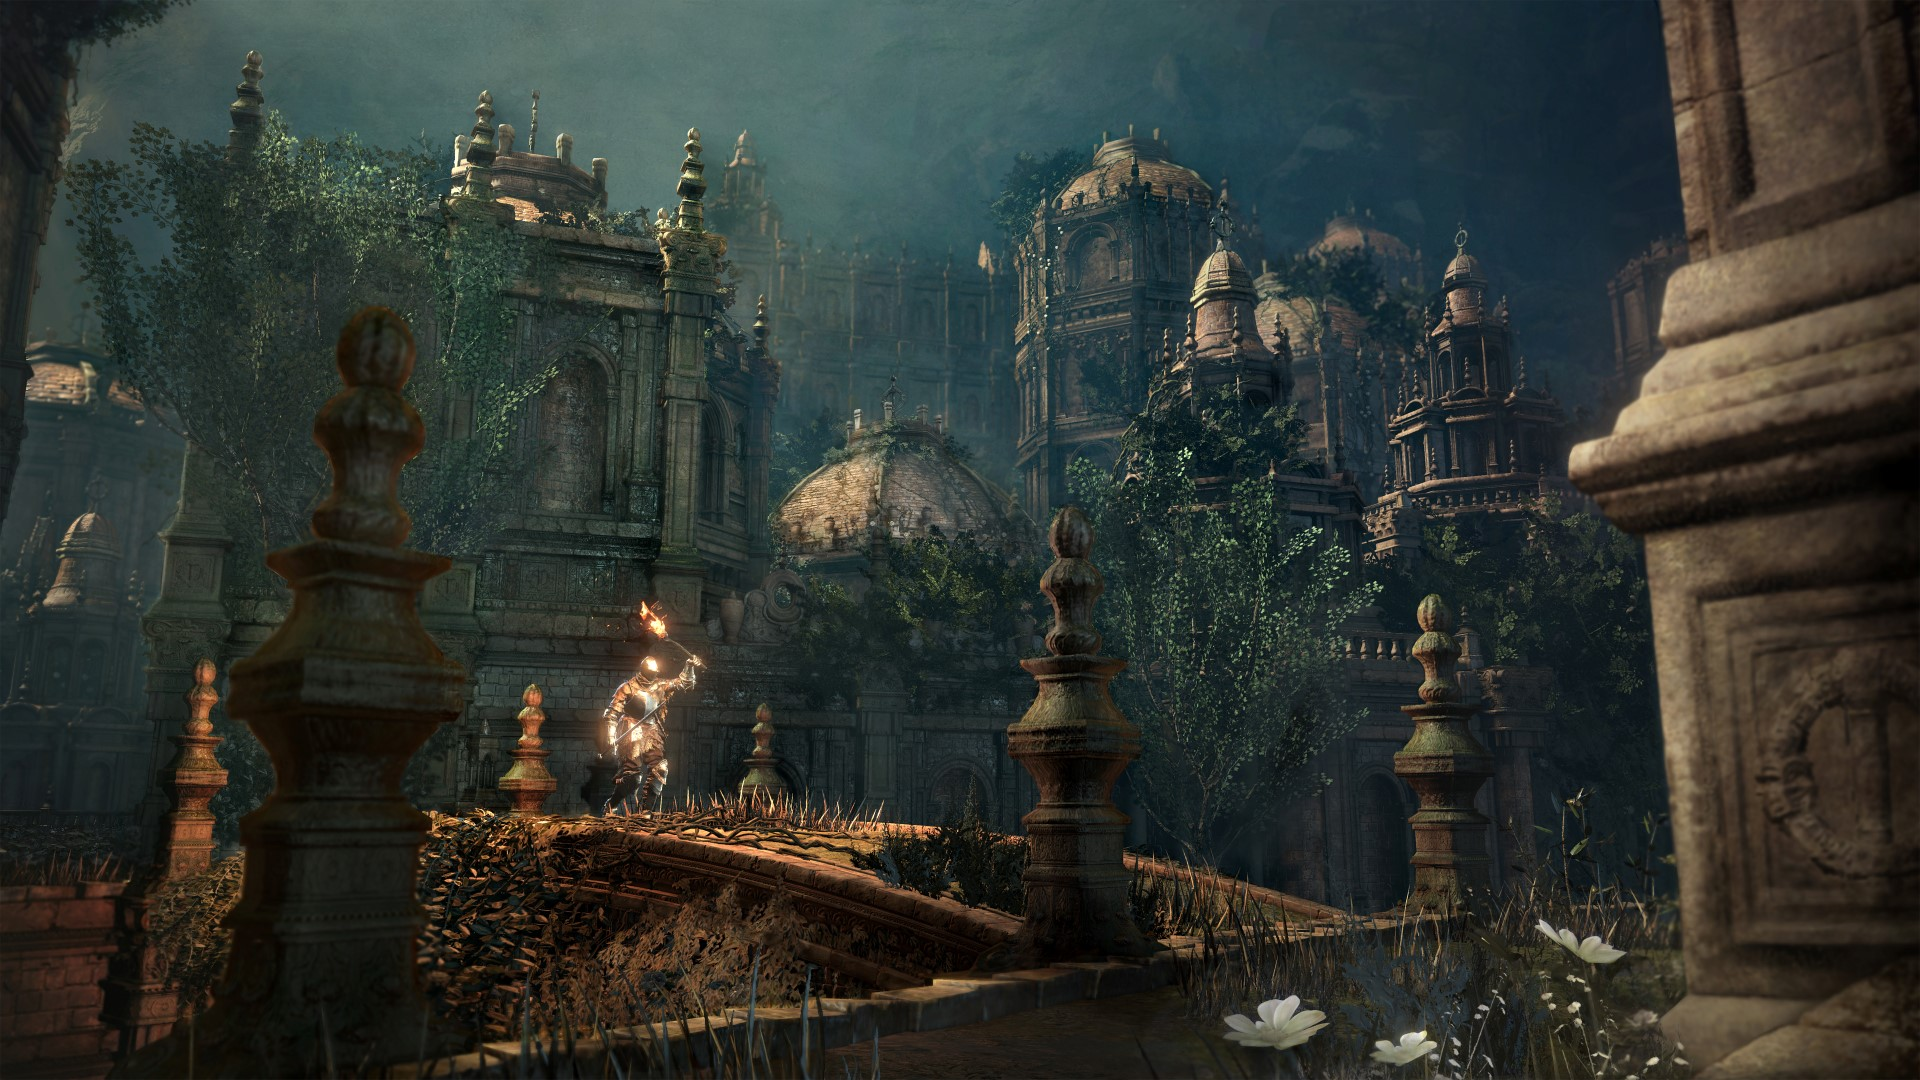 Dark Souls 3 The Ringed City Full Walkthrough The Ringed City